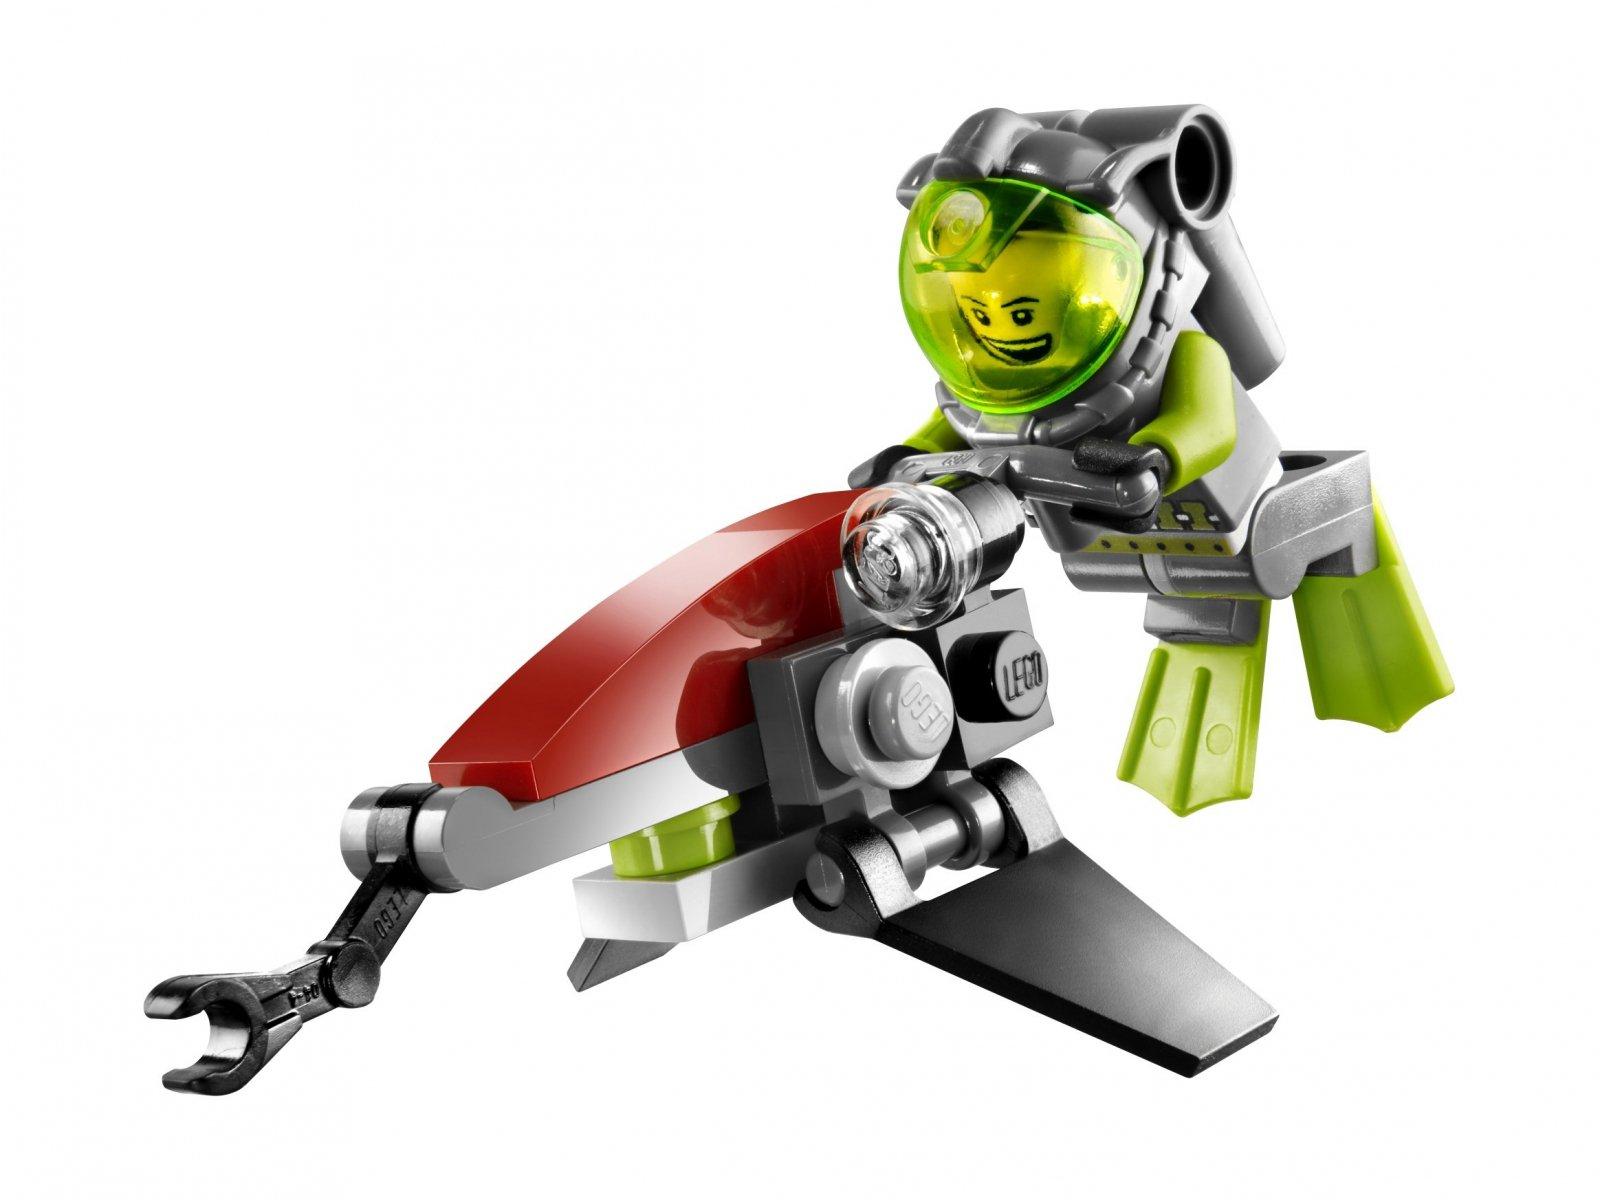 LEGO 8072 Atlantis Morski odrzutowiec